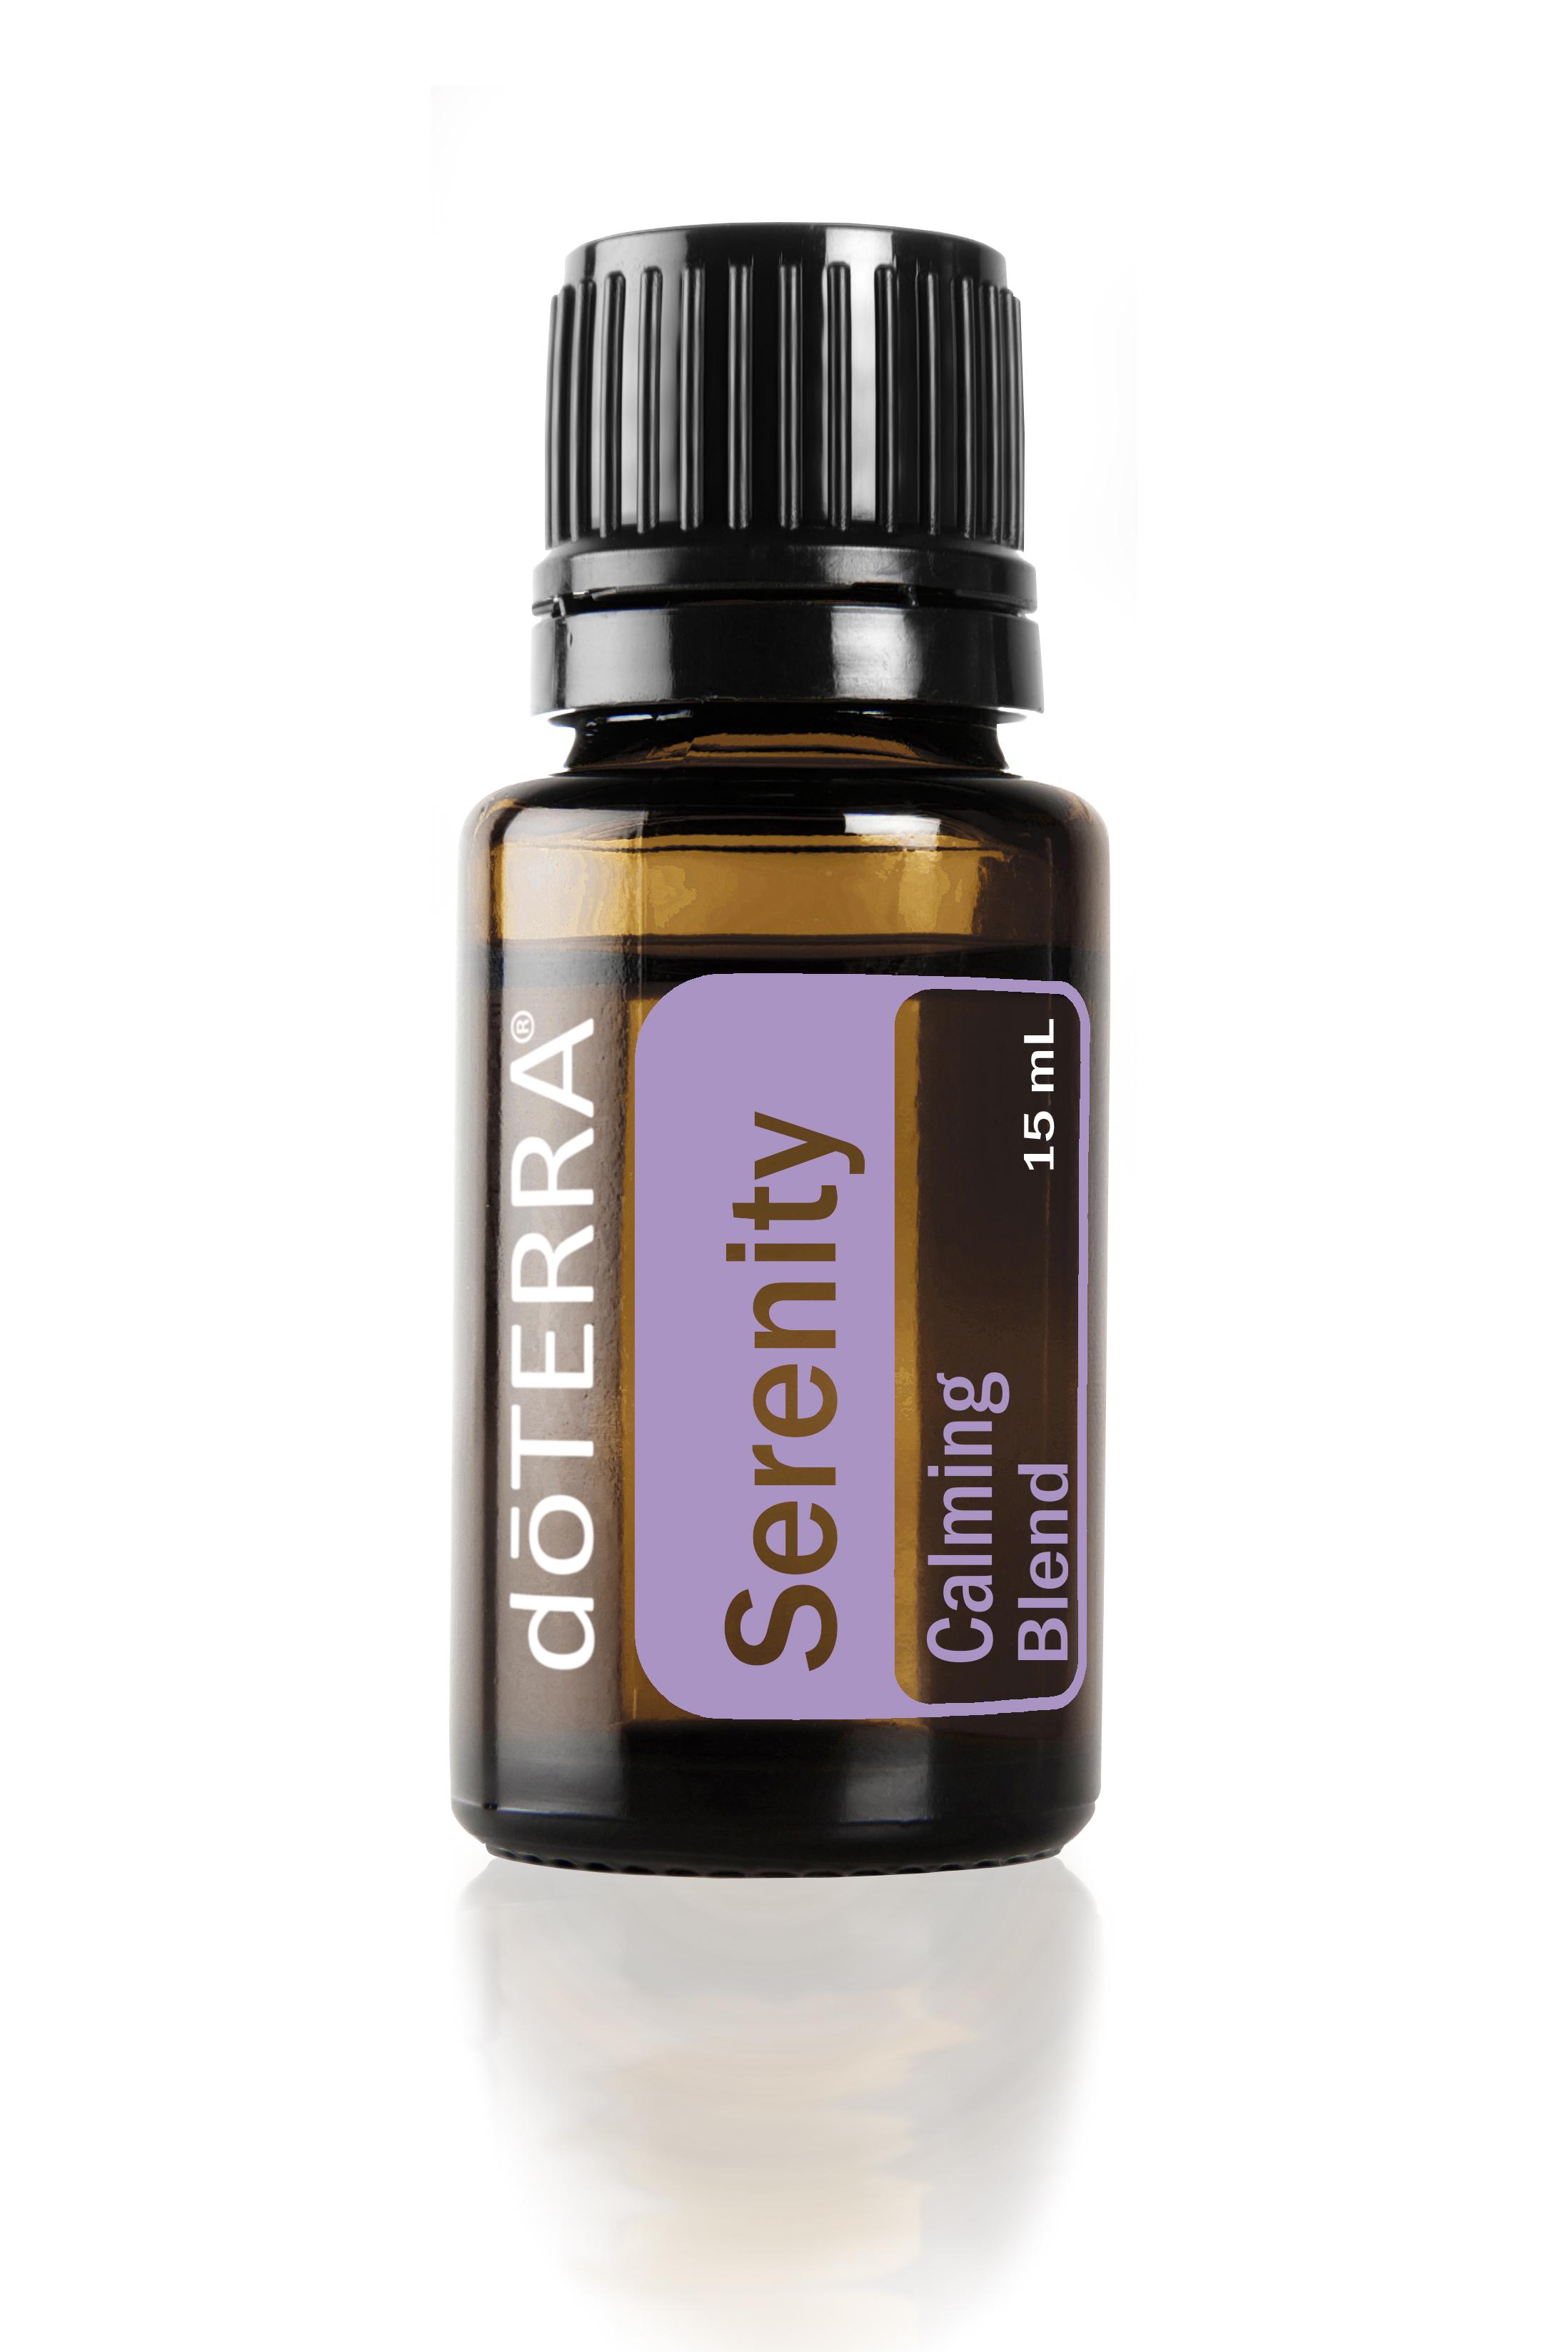 Serenity Essential Oils Calming Blend